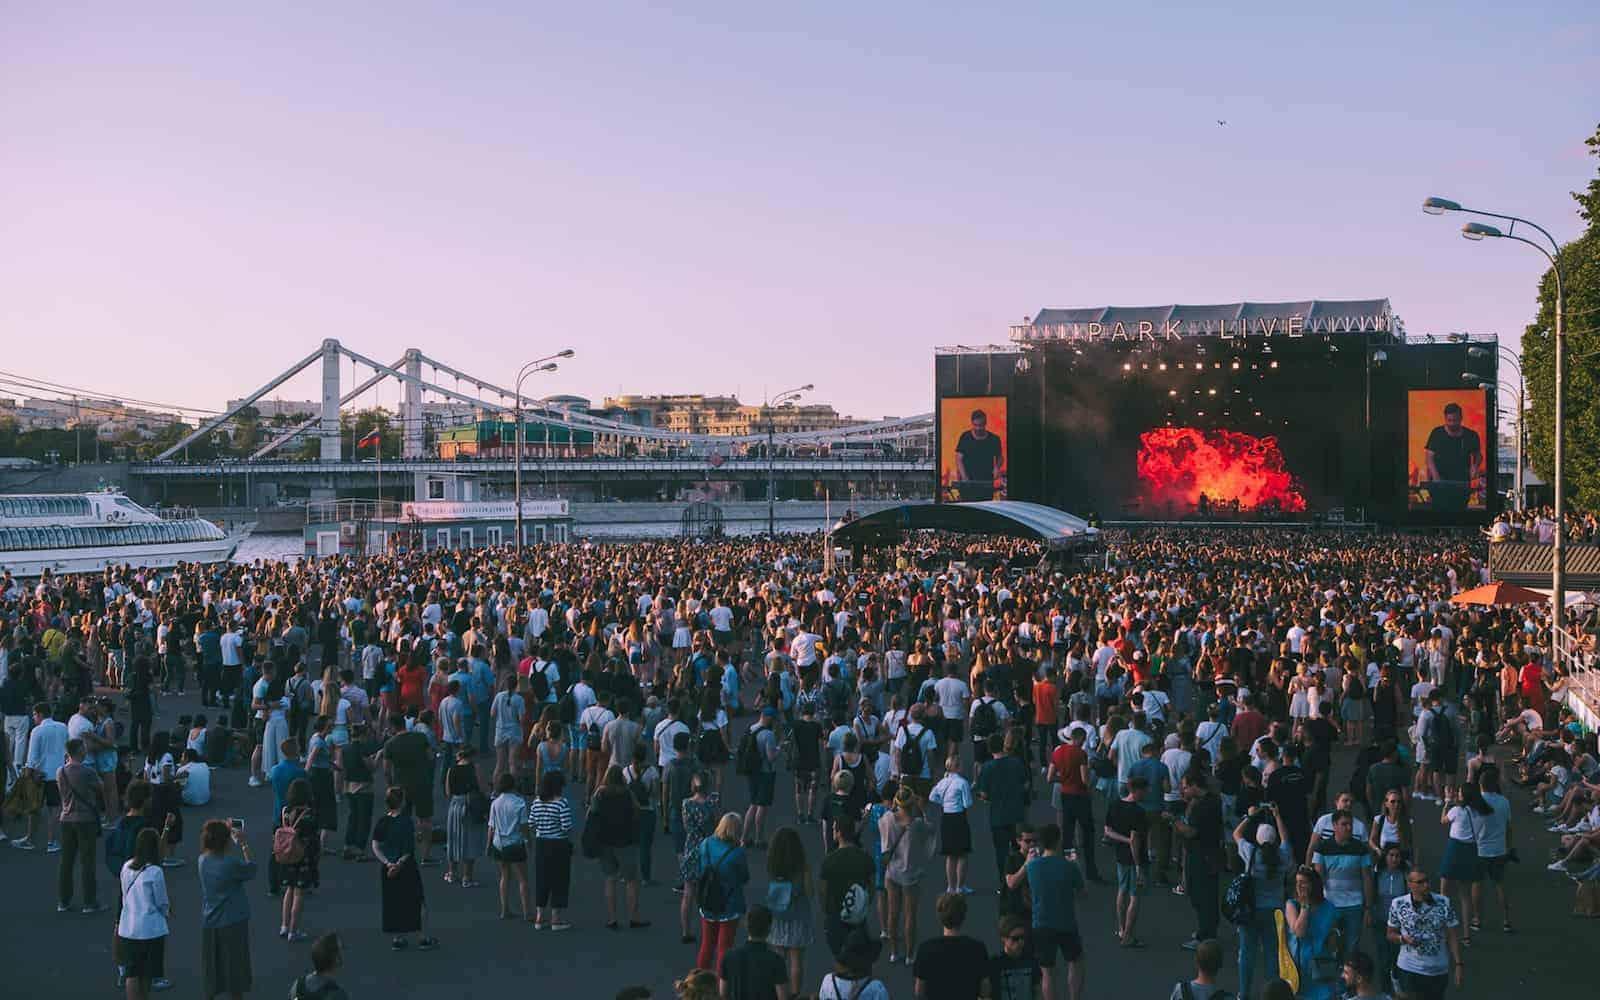 Фестиваль Park Live 2019 в Москве